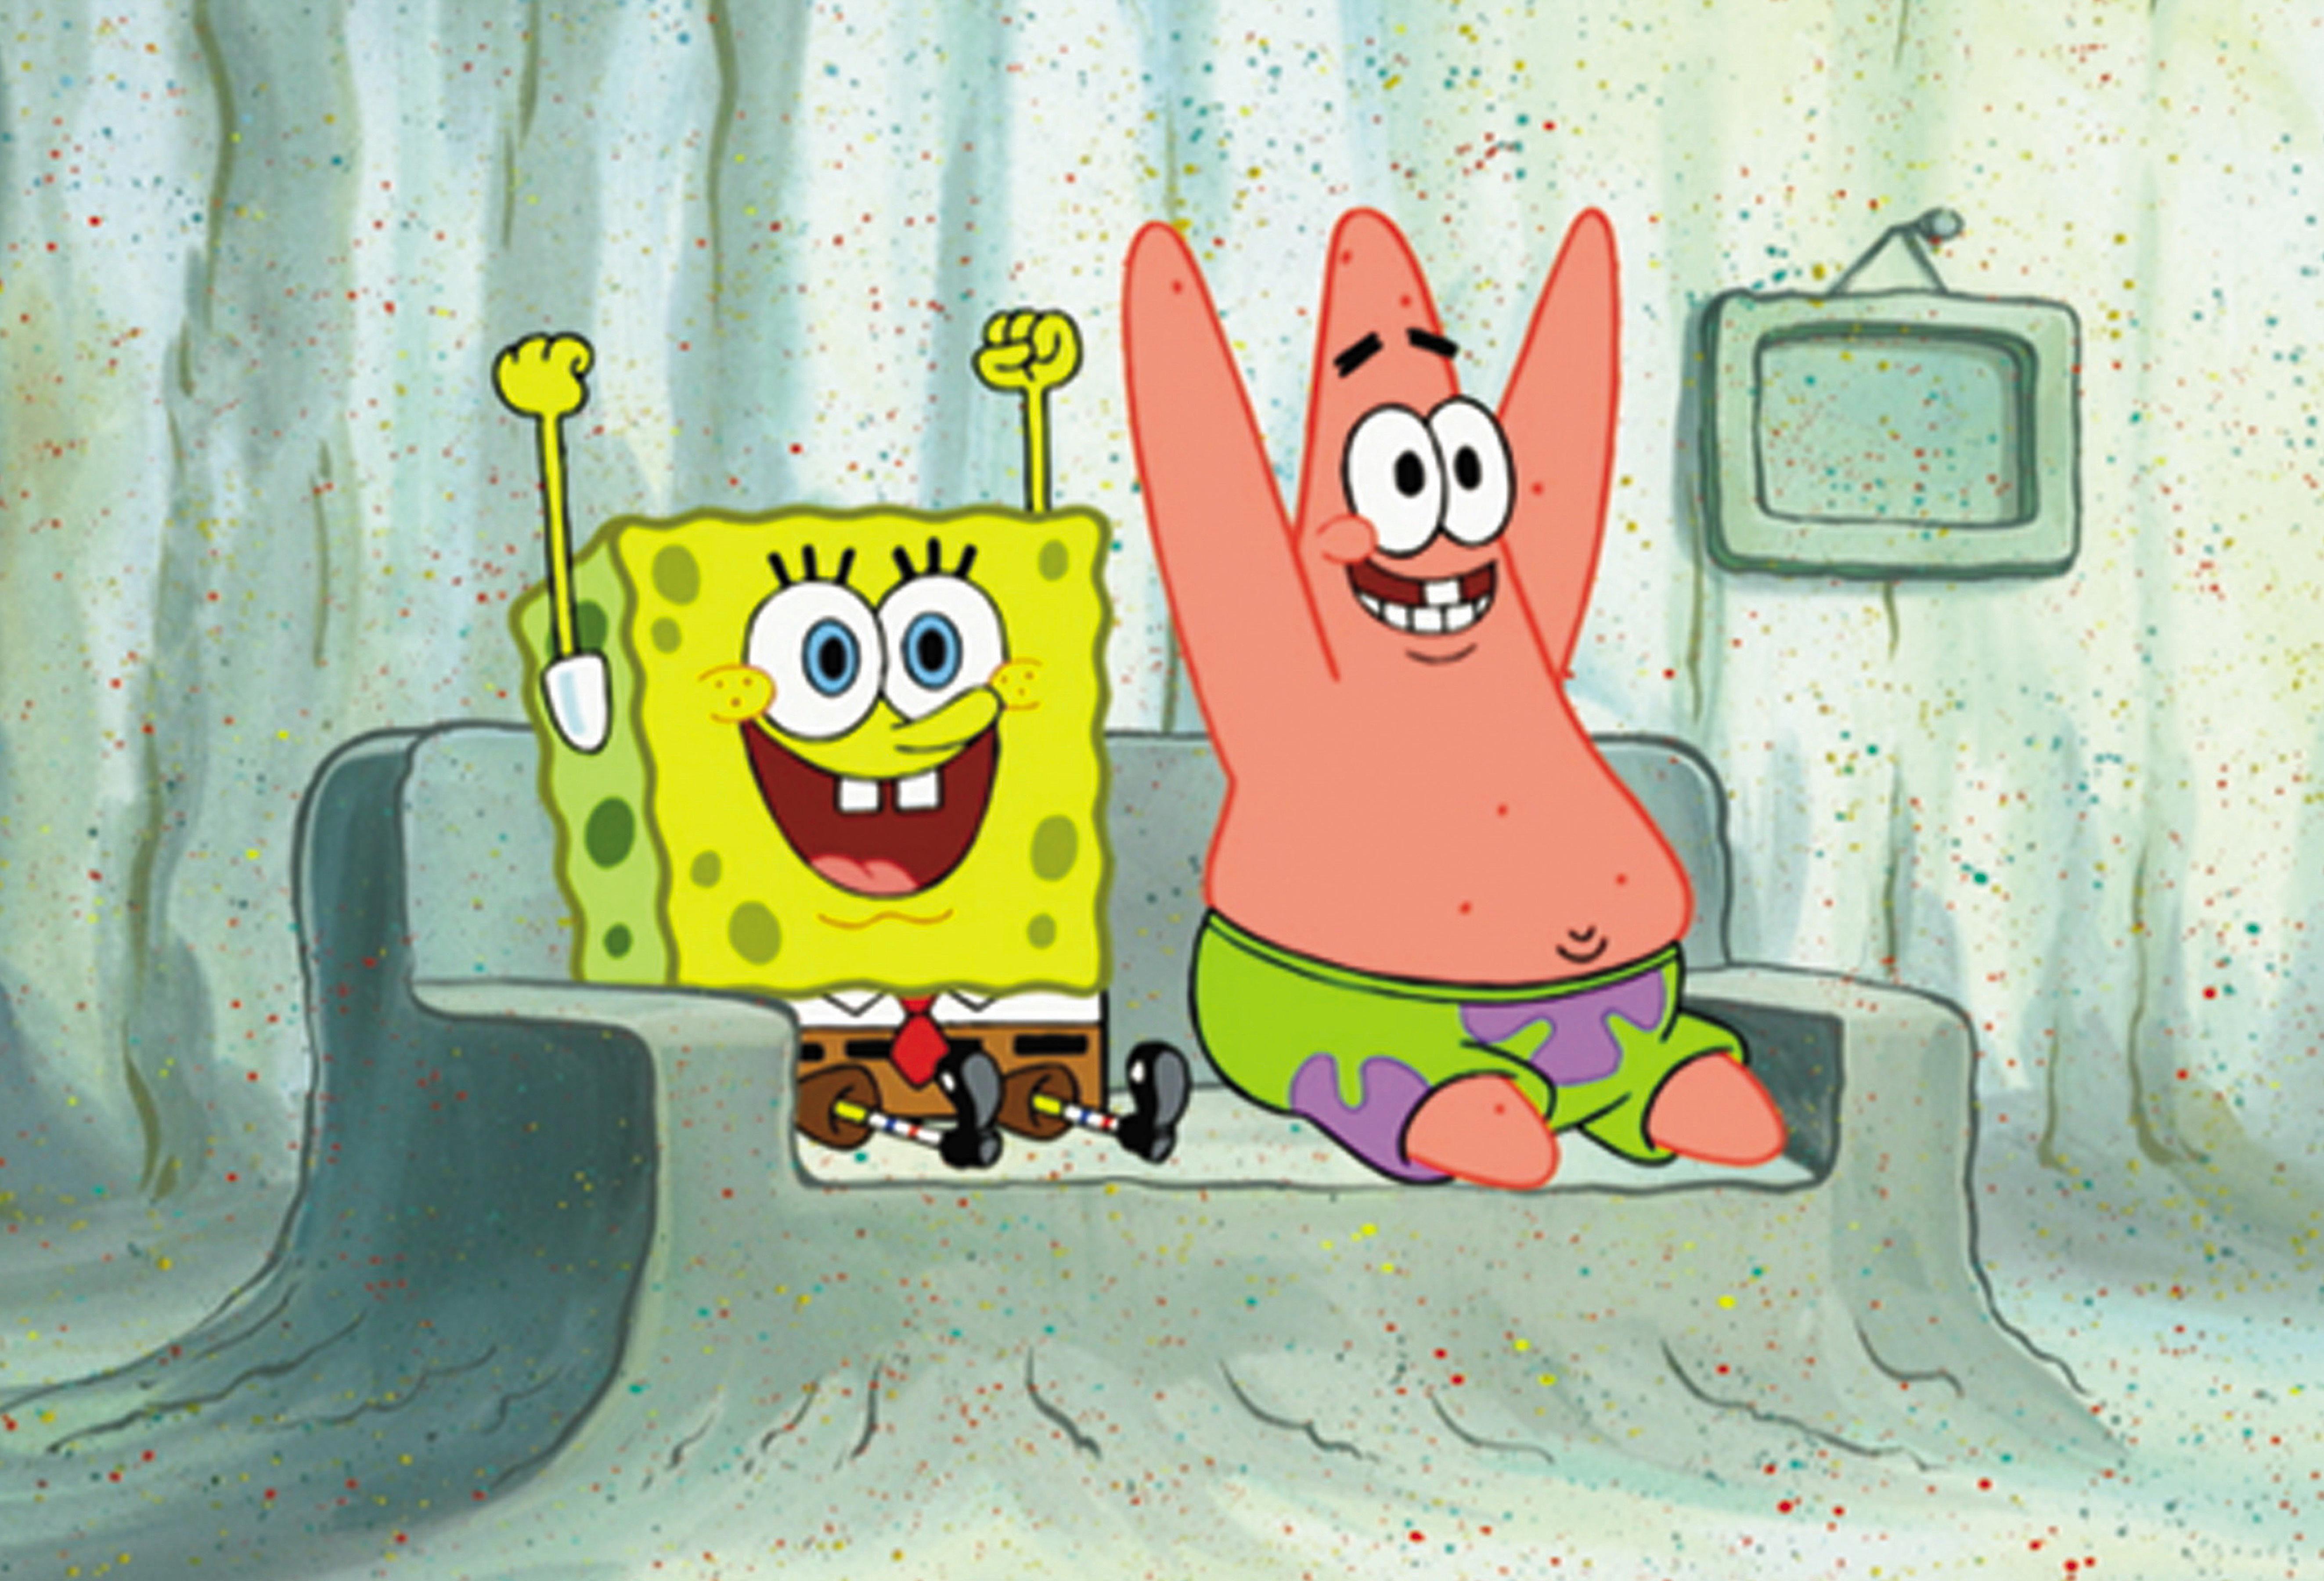 spongebob squarepants u0027 cast list of voice actors